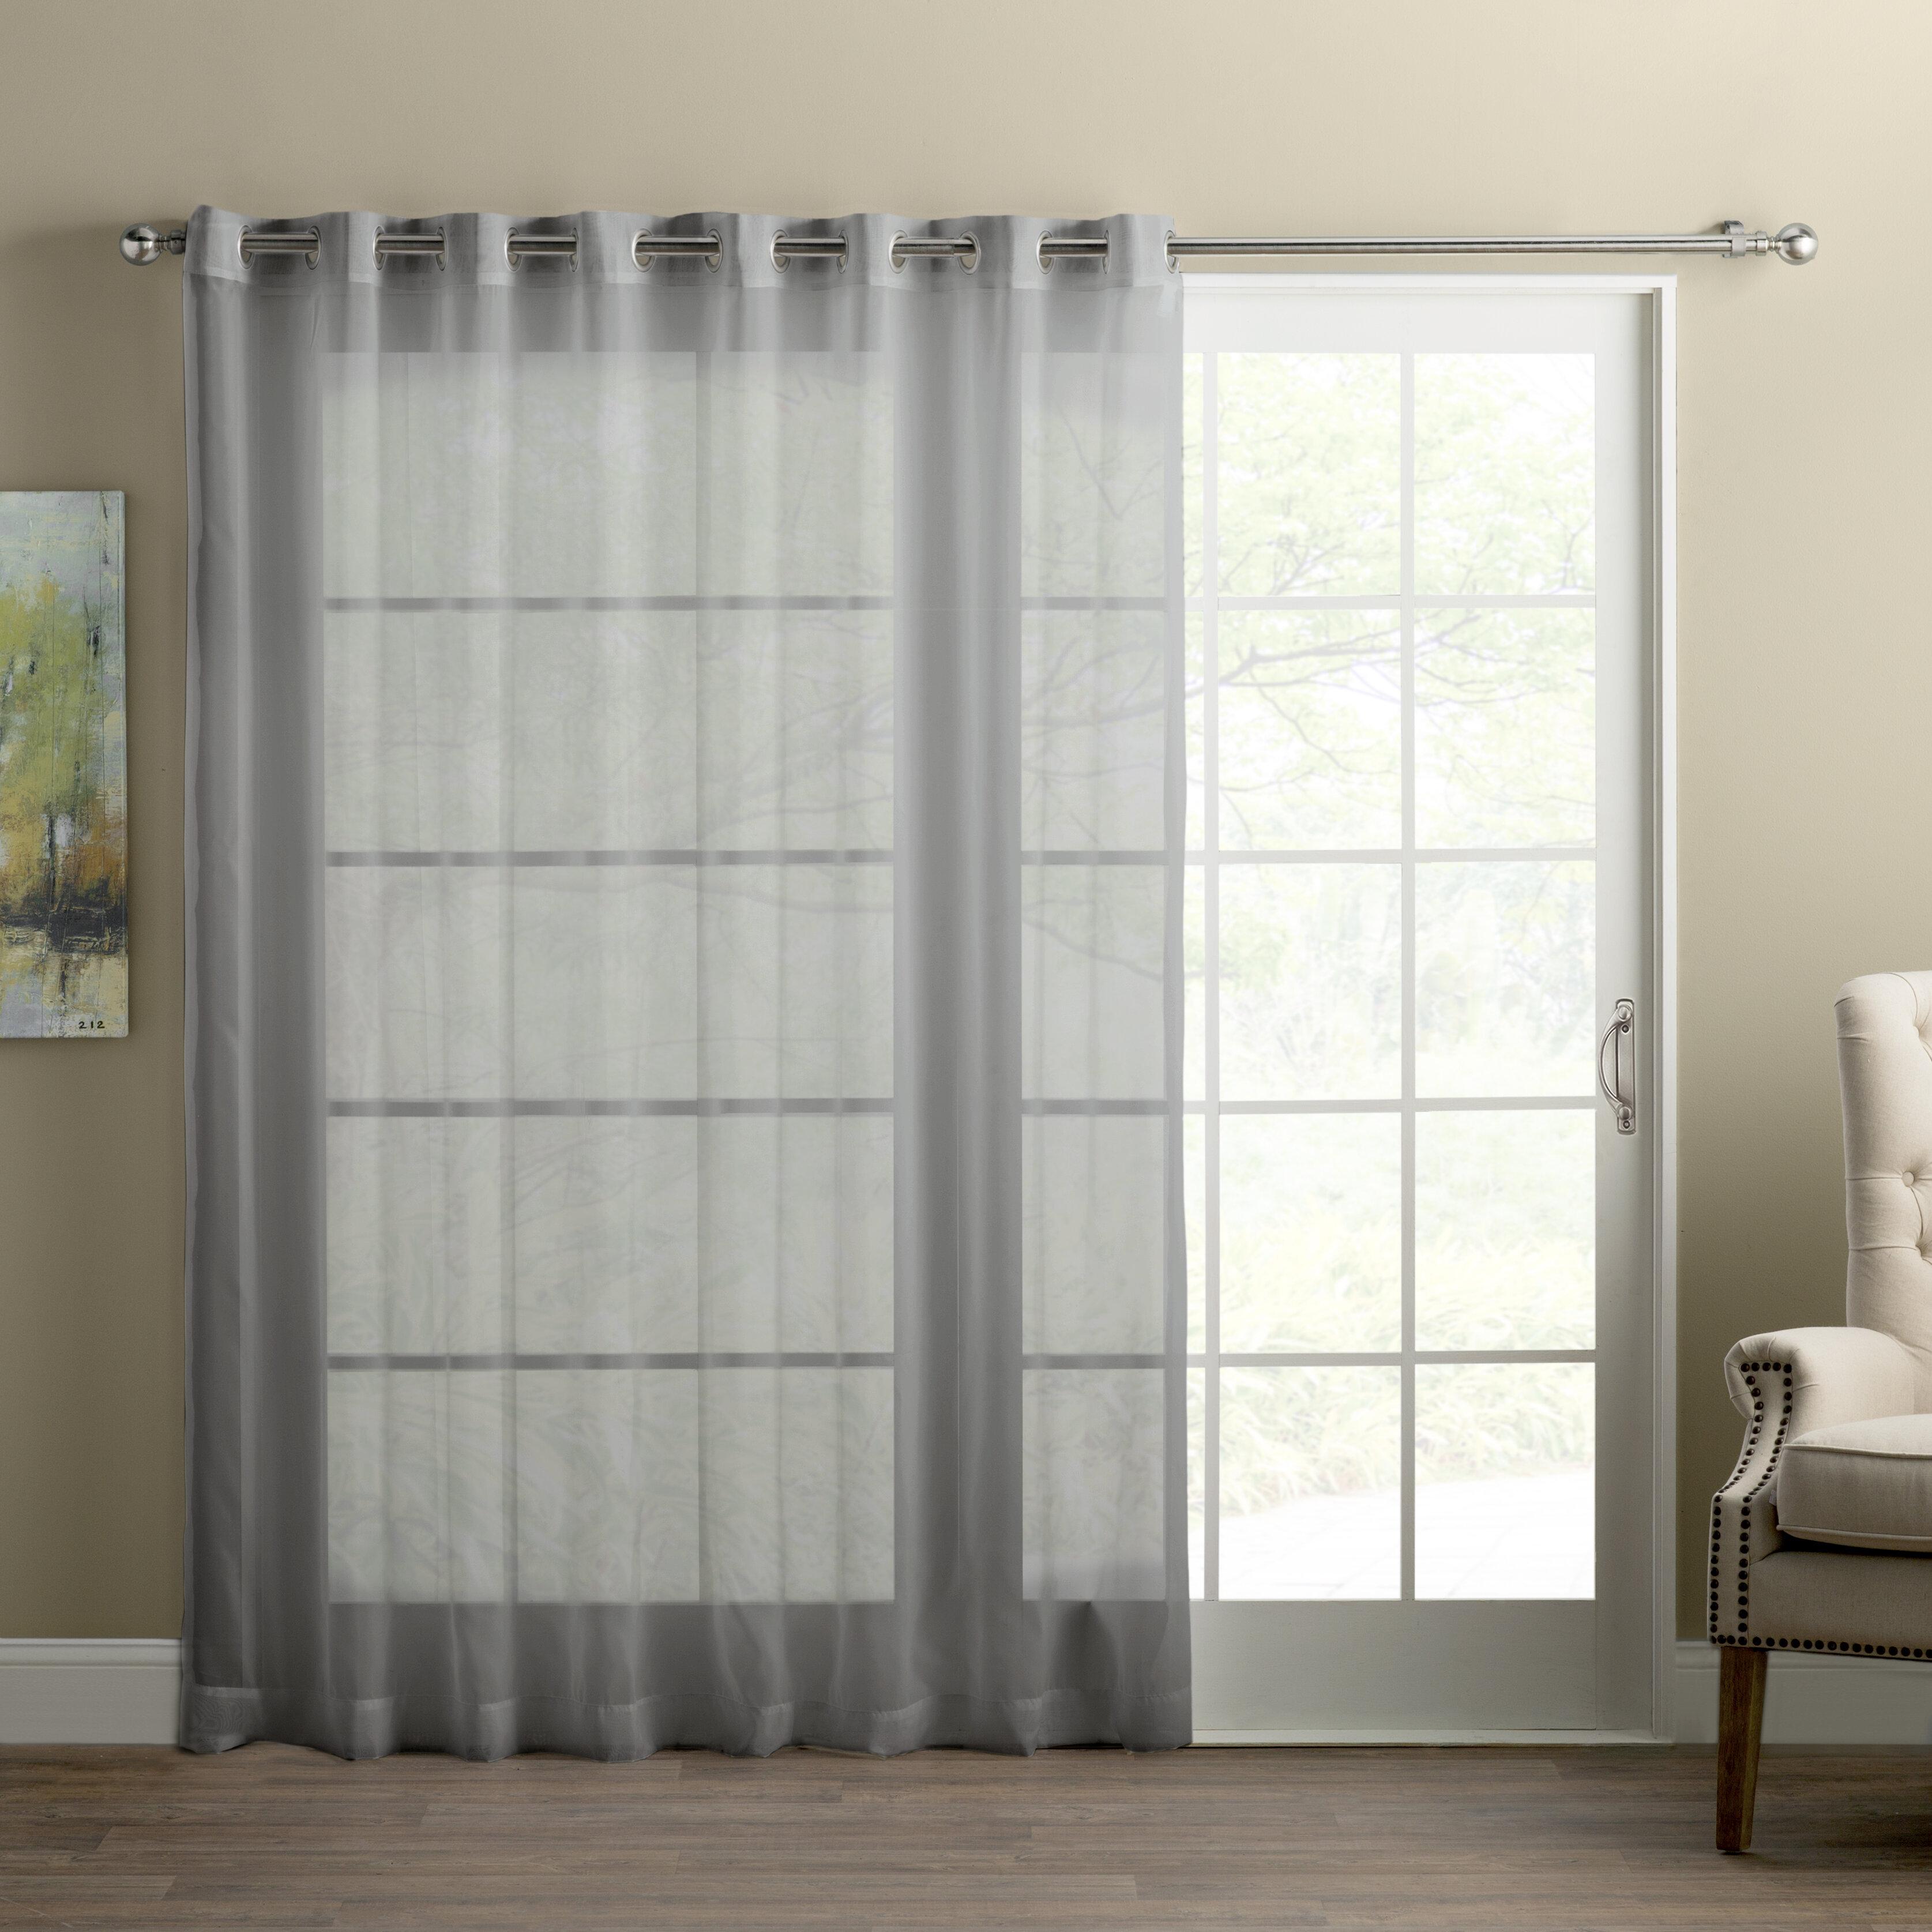 Wayfair Basics Sliding Door Patio Solid Semi Sheer Grommet Single Curtain Panel